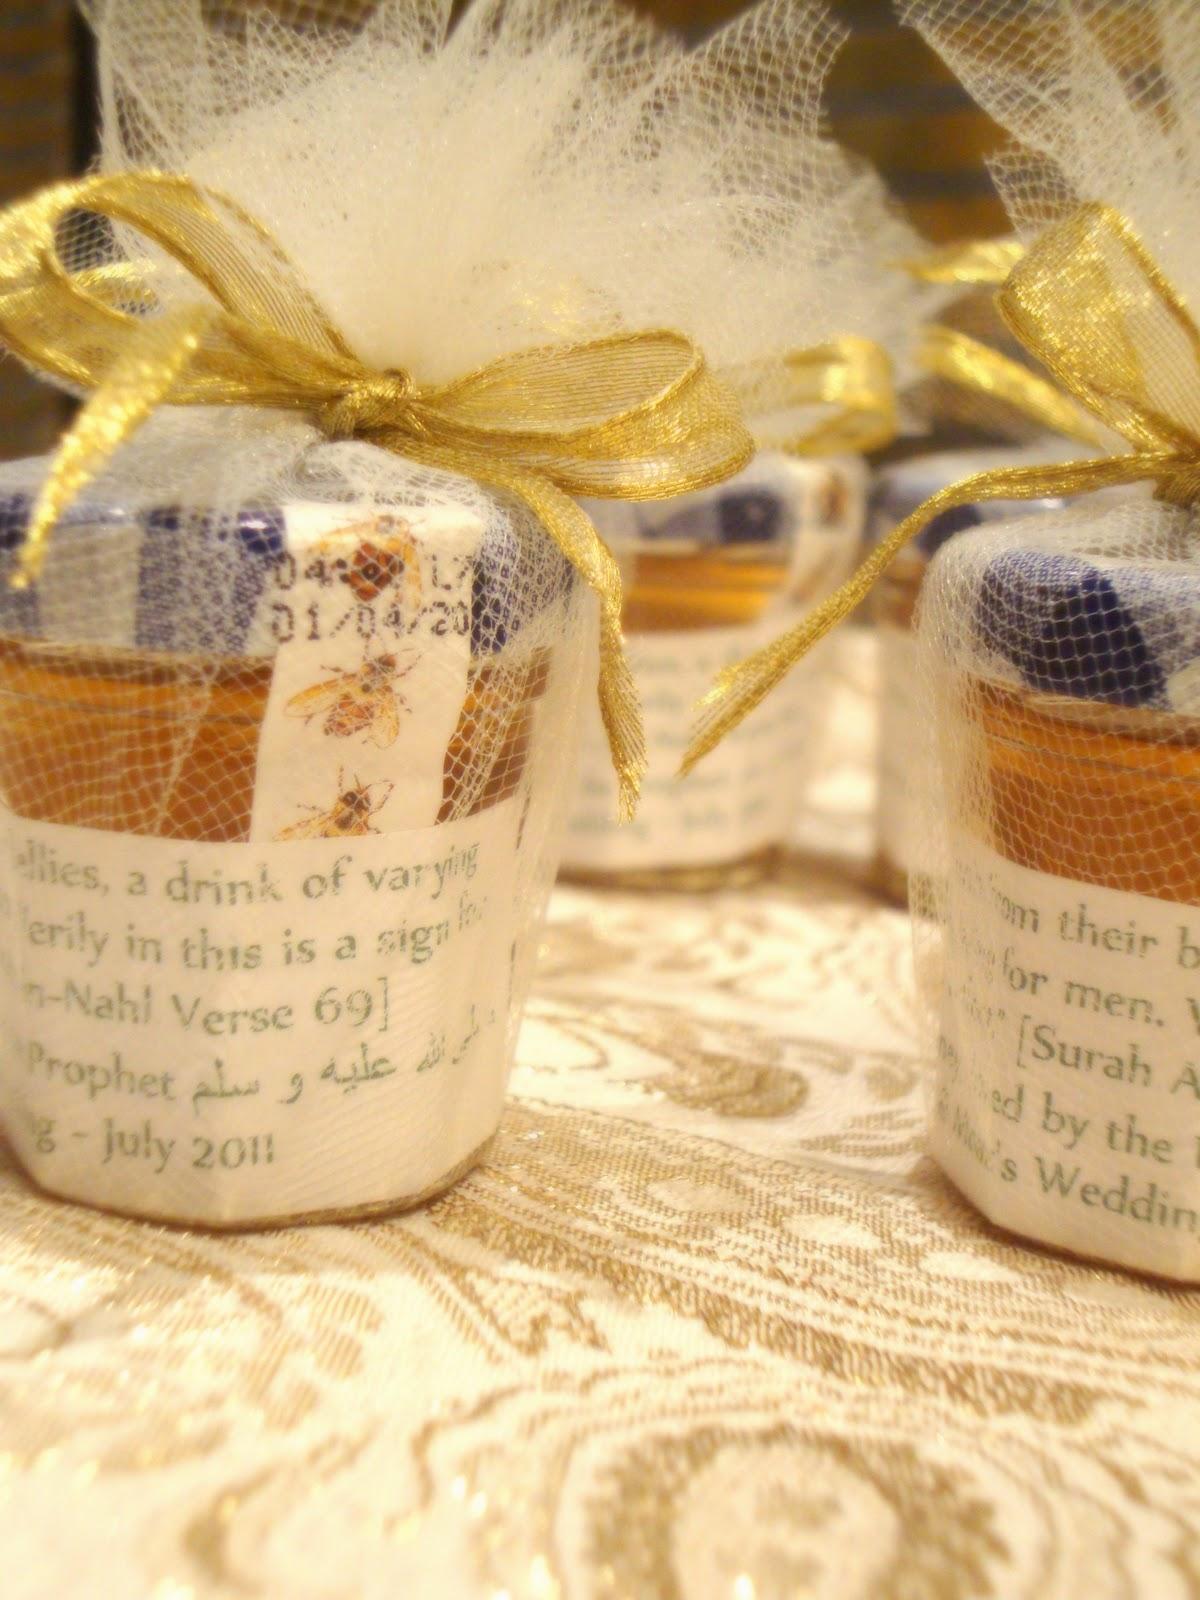 Bargain Party Decorations Honey Sweet Home Diy Wedding Mehndi Decor Ideas On The Cheap